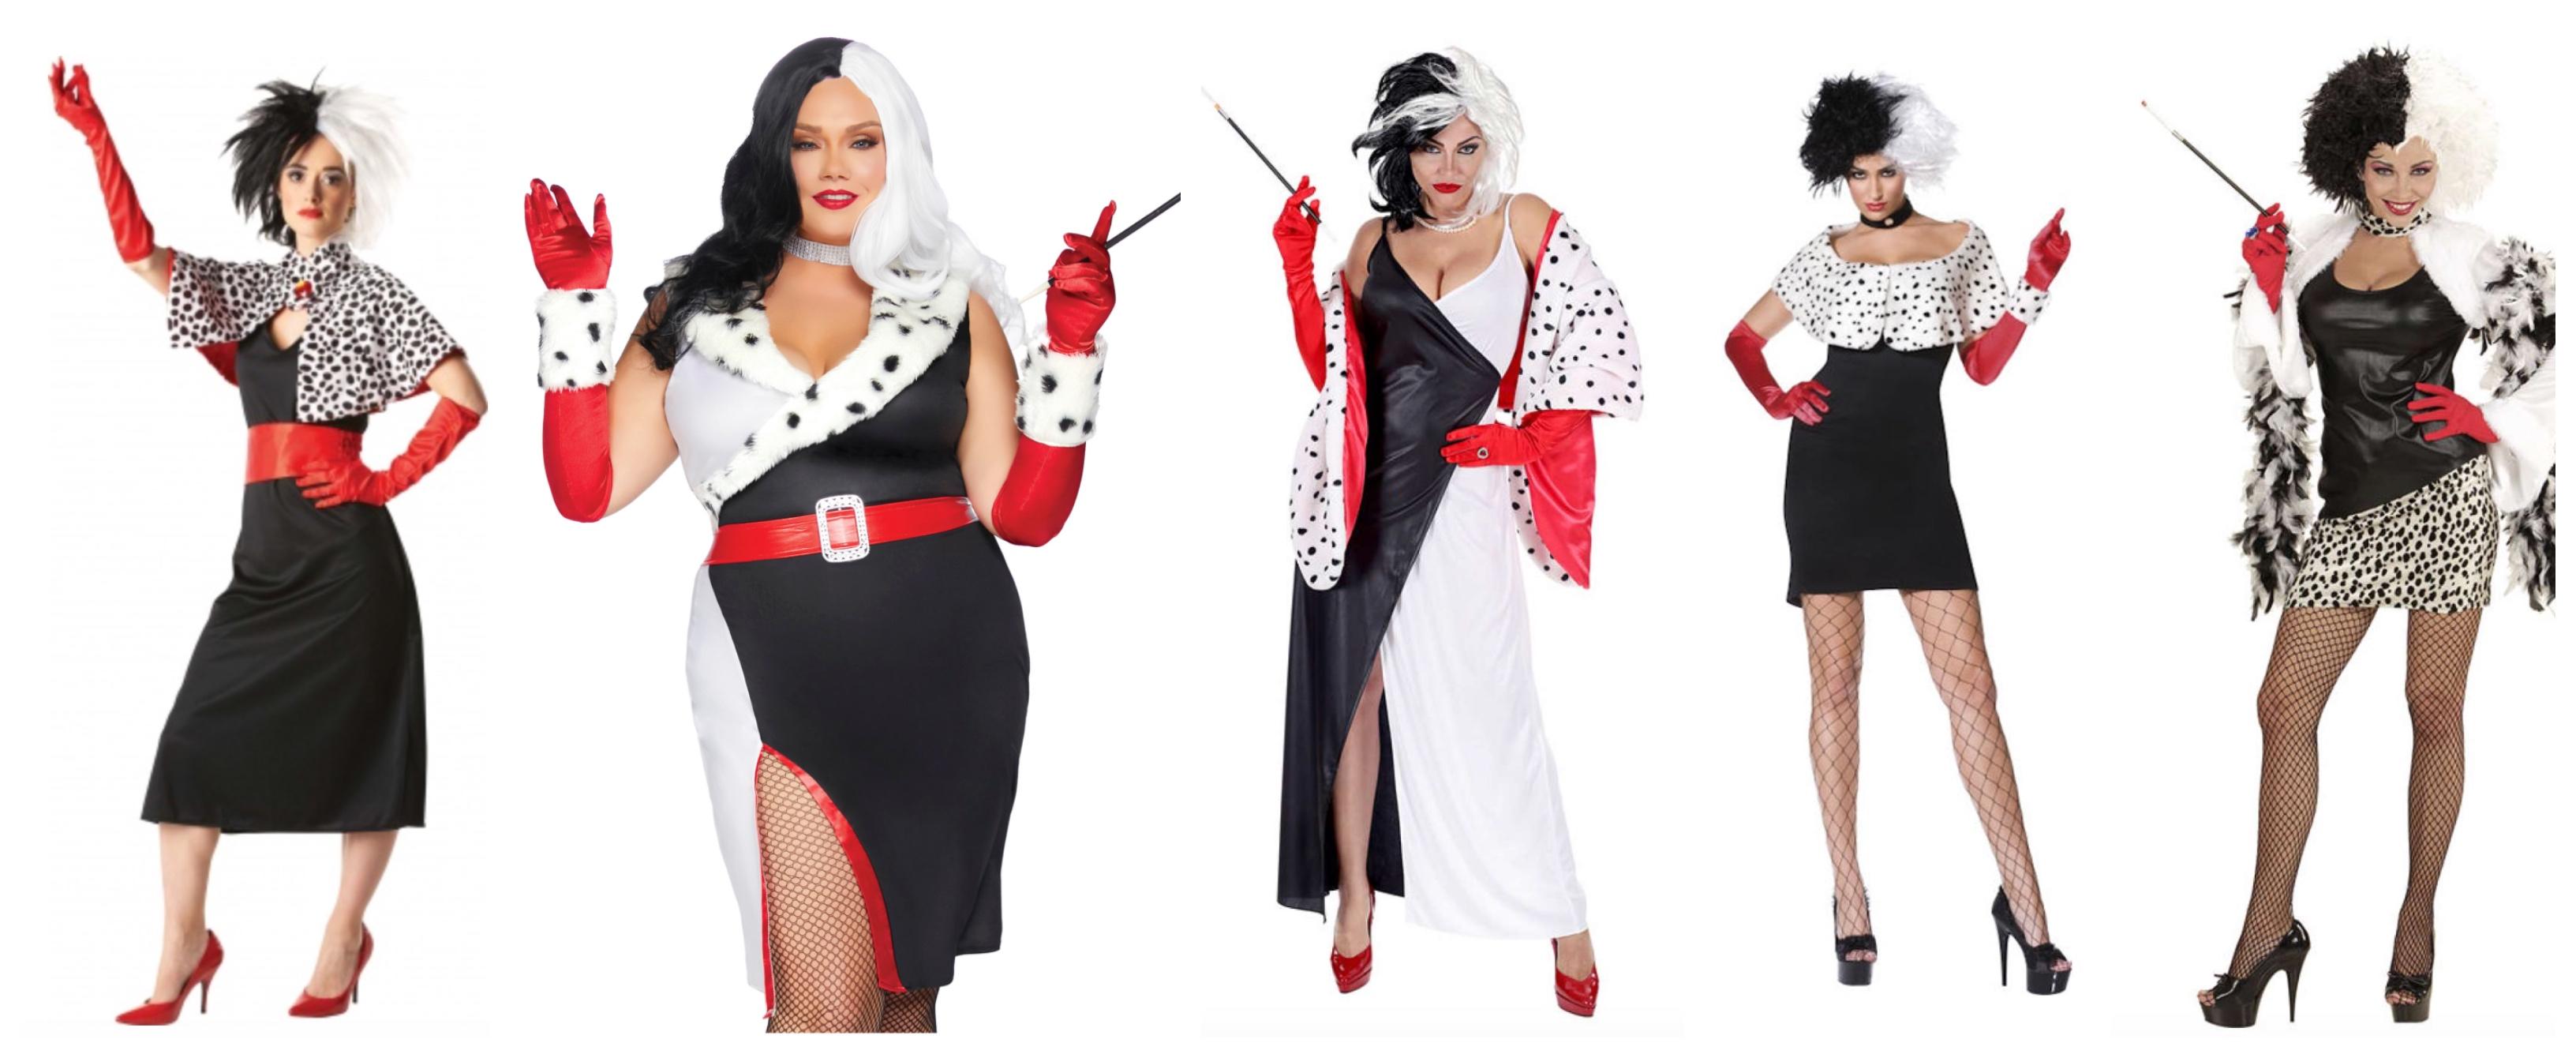 cruella de vil voksenkostume - Cruella de vil kostume til voksne